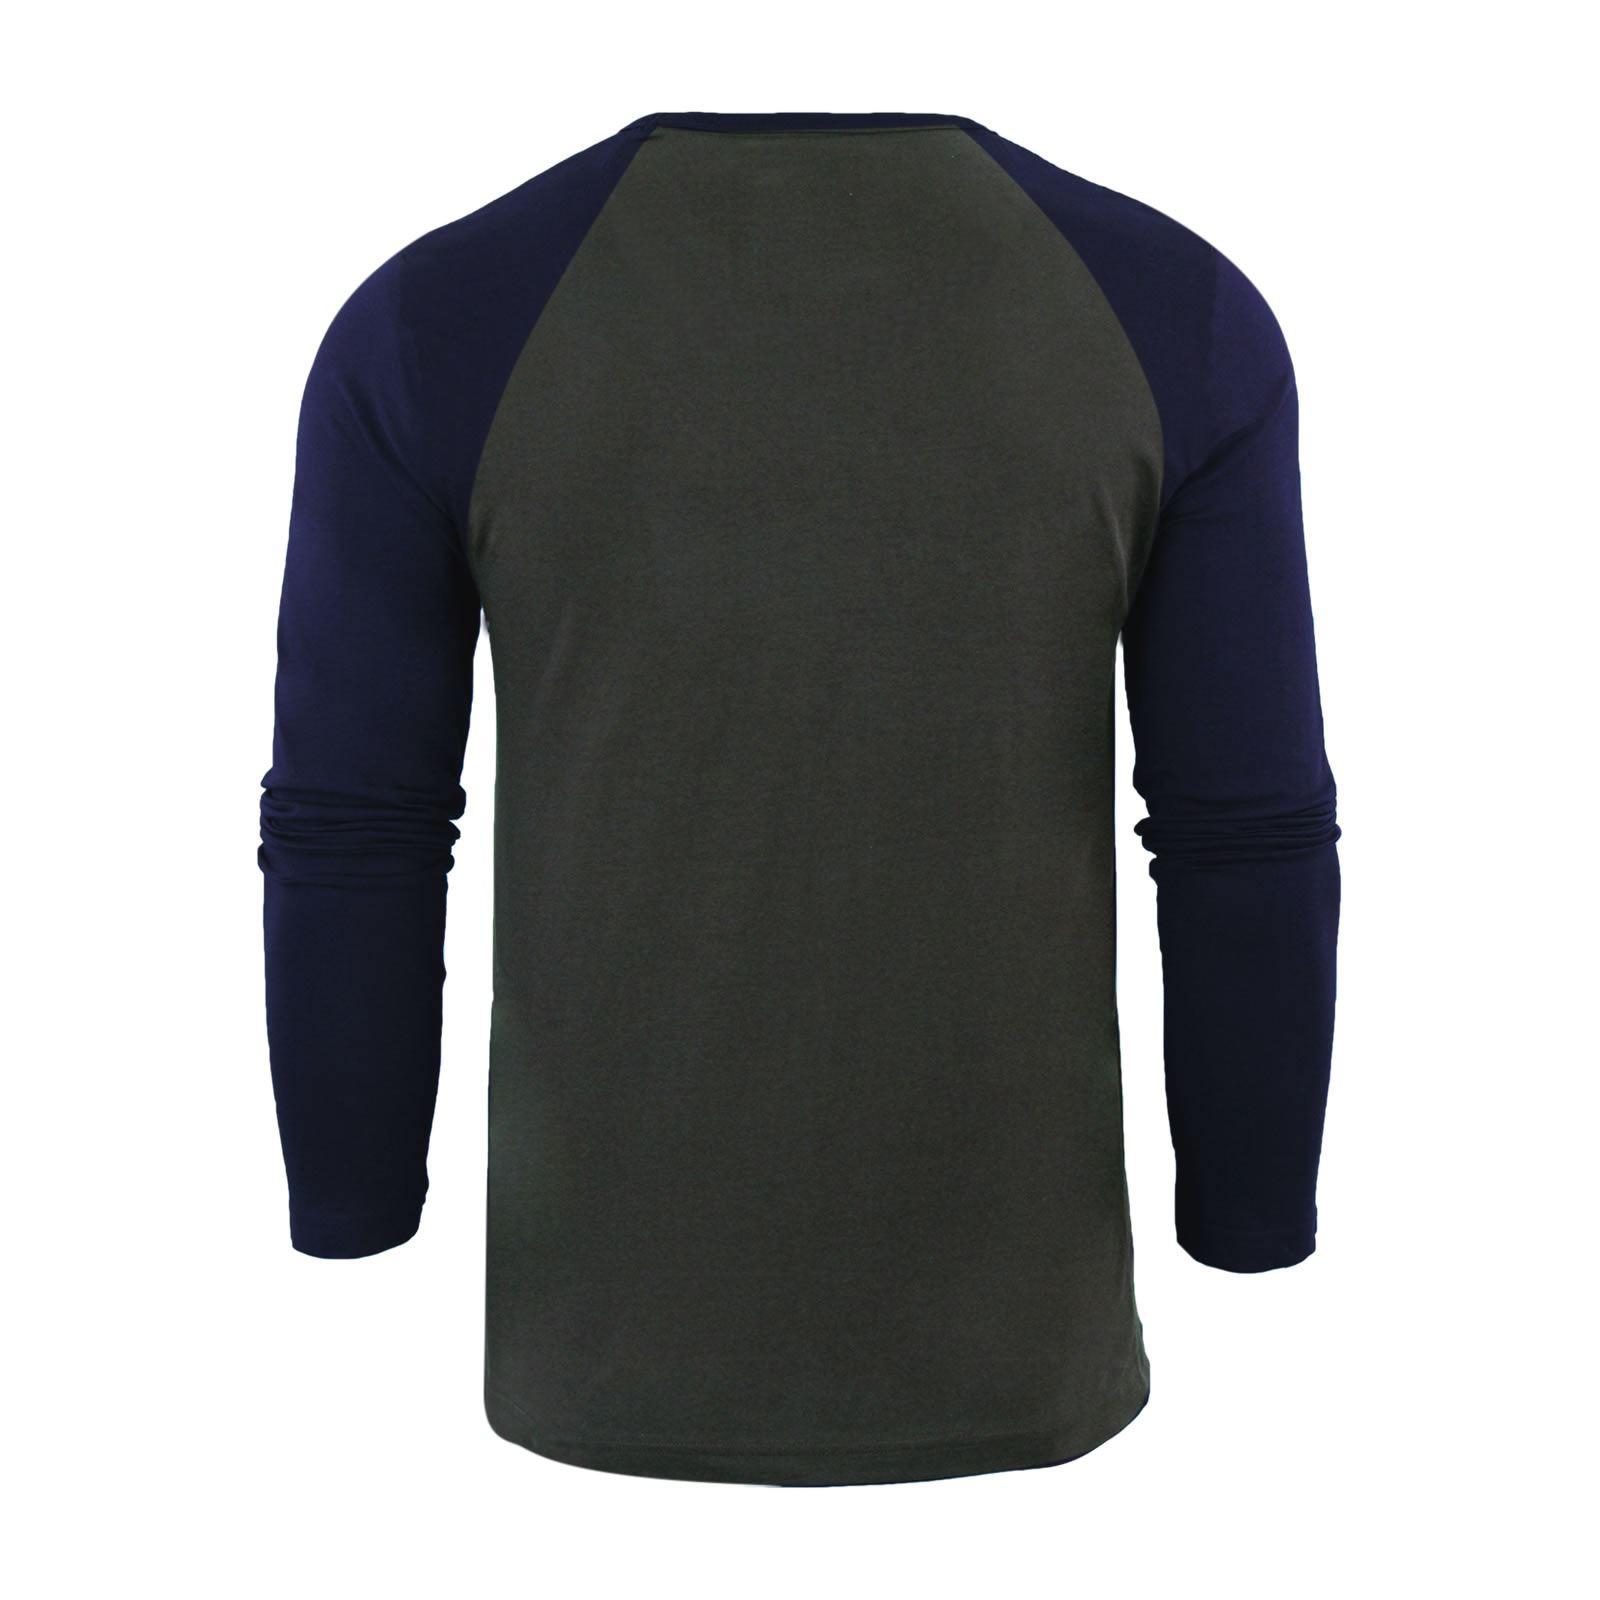 FOGGI Damenbluse Bluse Tunika T-Shirt Top Longshirt Oberteil 34-36 #F298